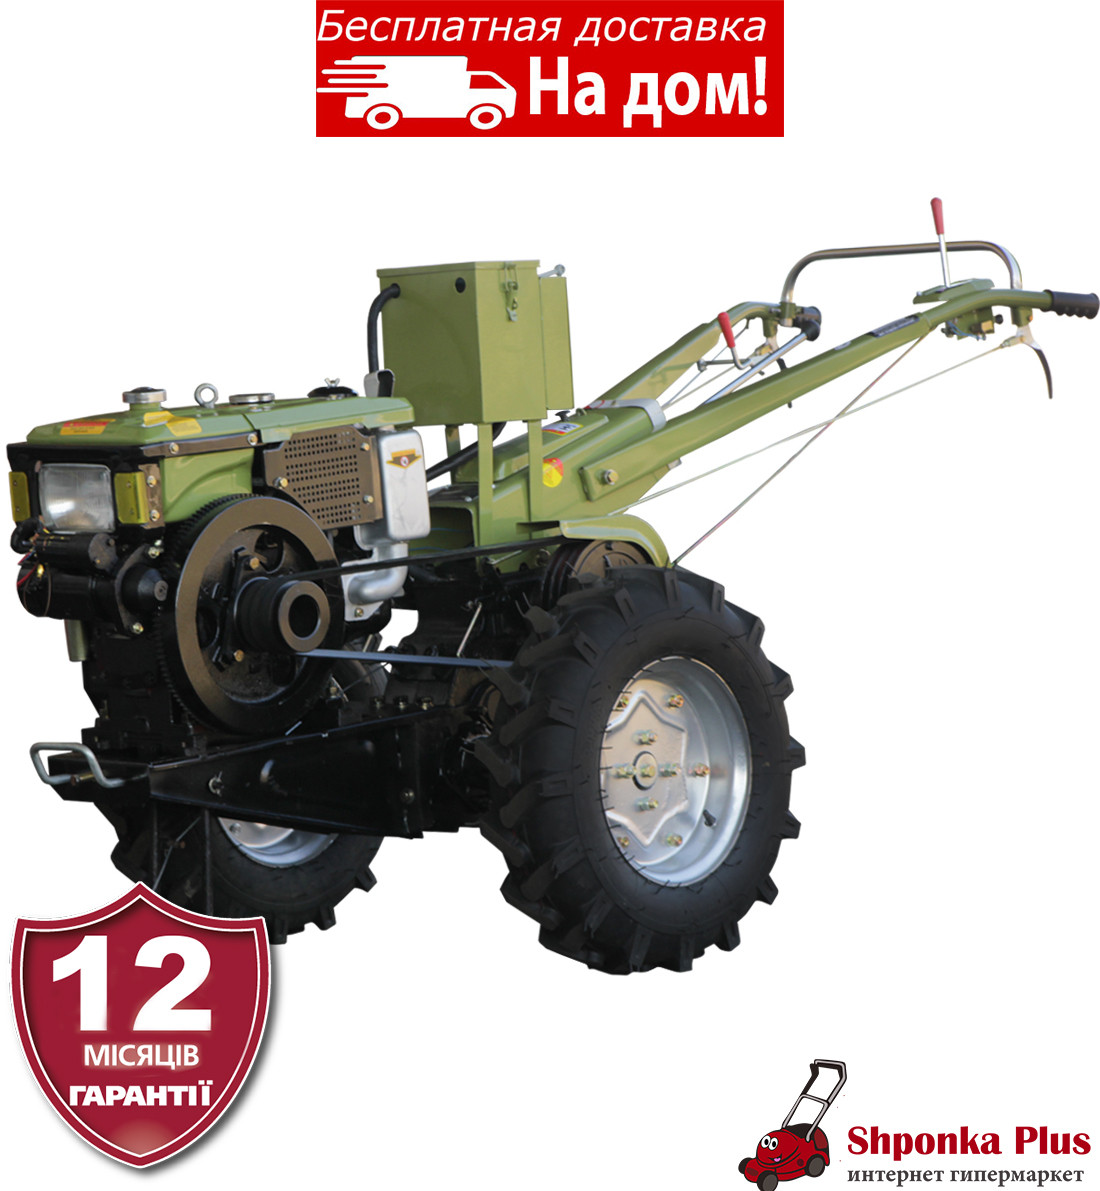 Мотоблок 10л.с., с фрезой, электростартер, Кентавр МБ 1010Е